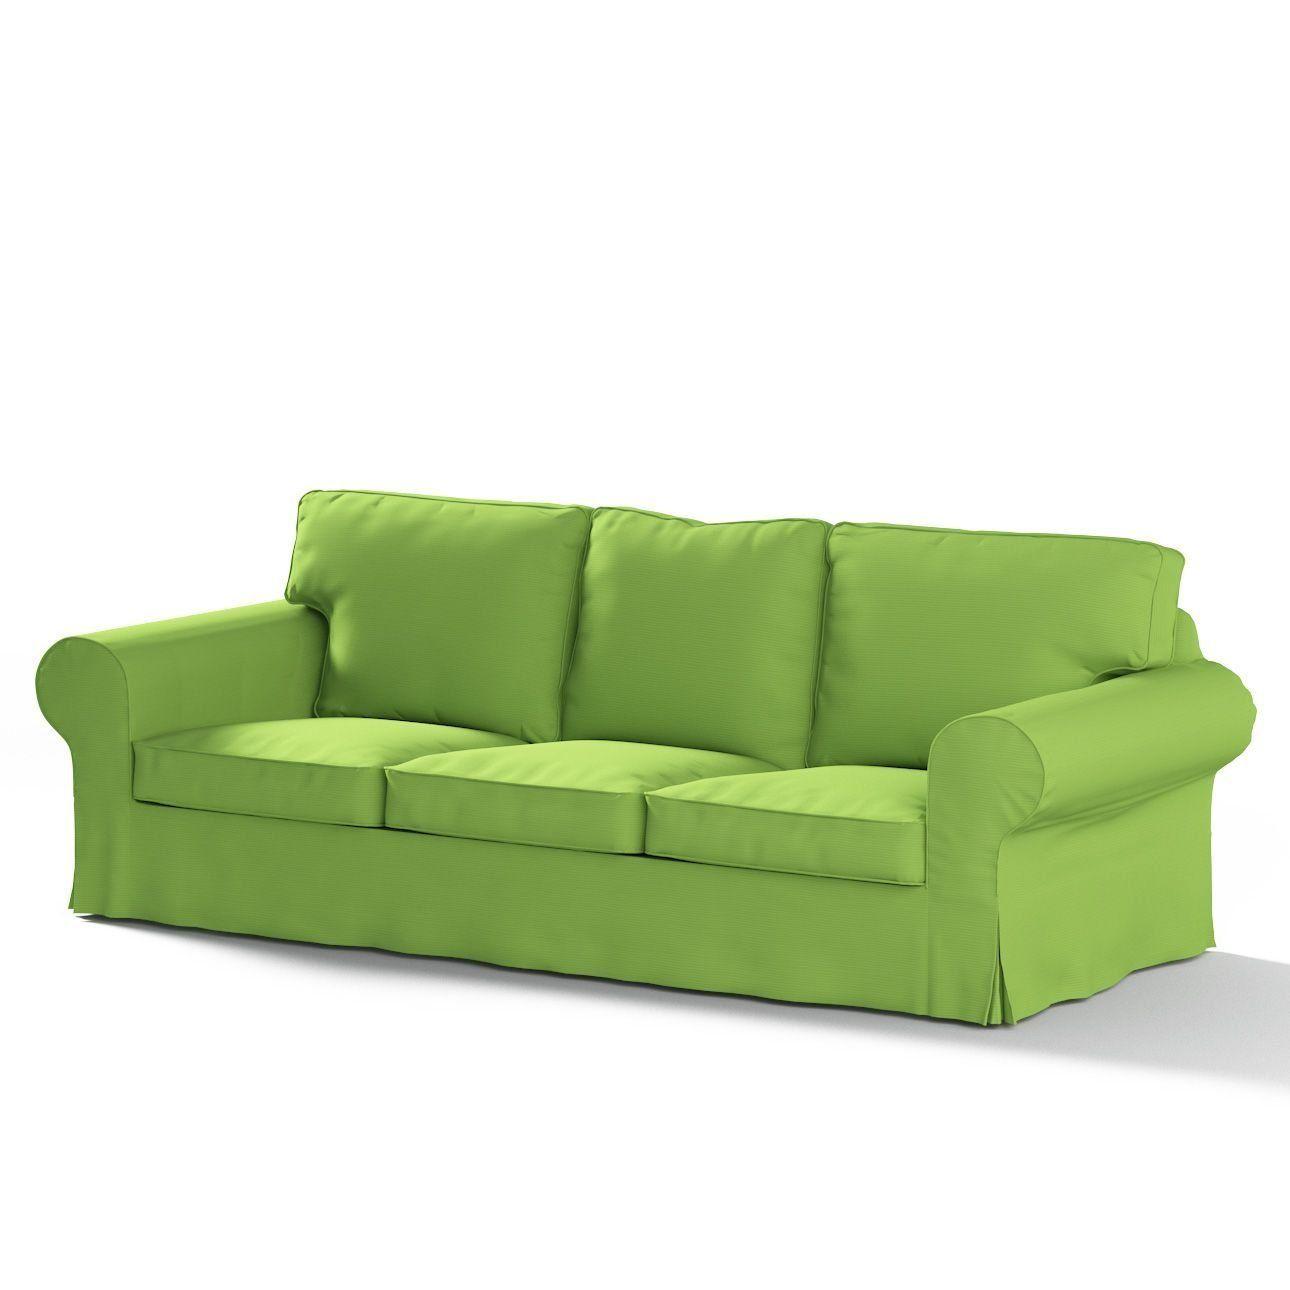 Franc Textile 610 702 27 Ektorp 3 Seater Sofa Cotton Panama Not Be